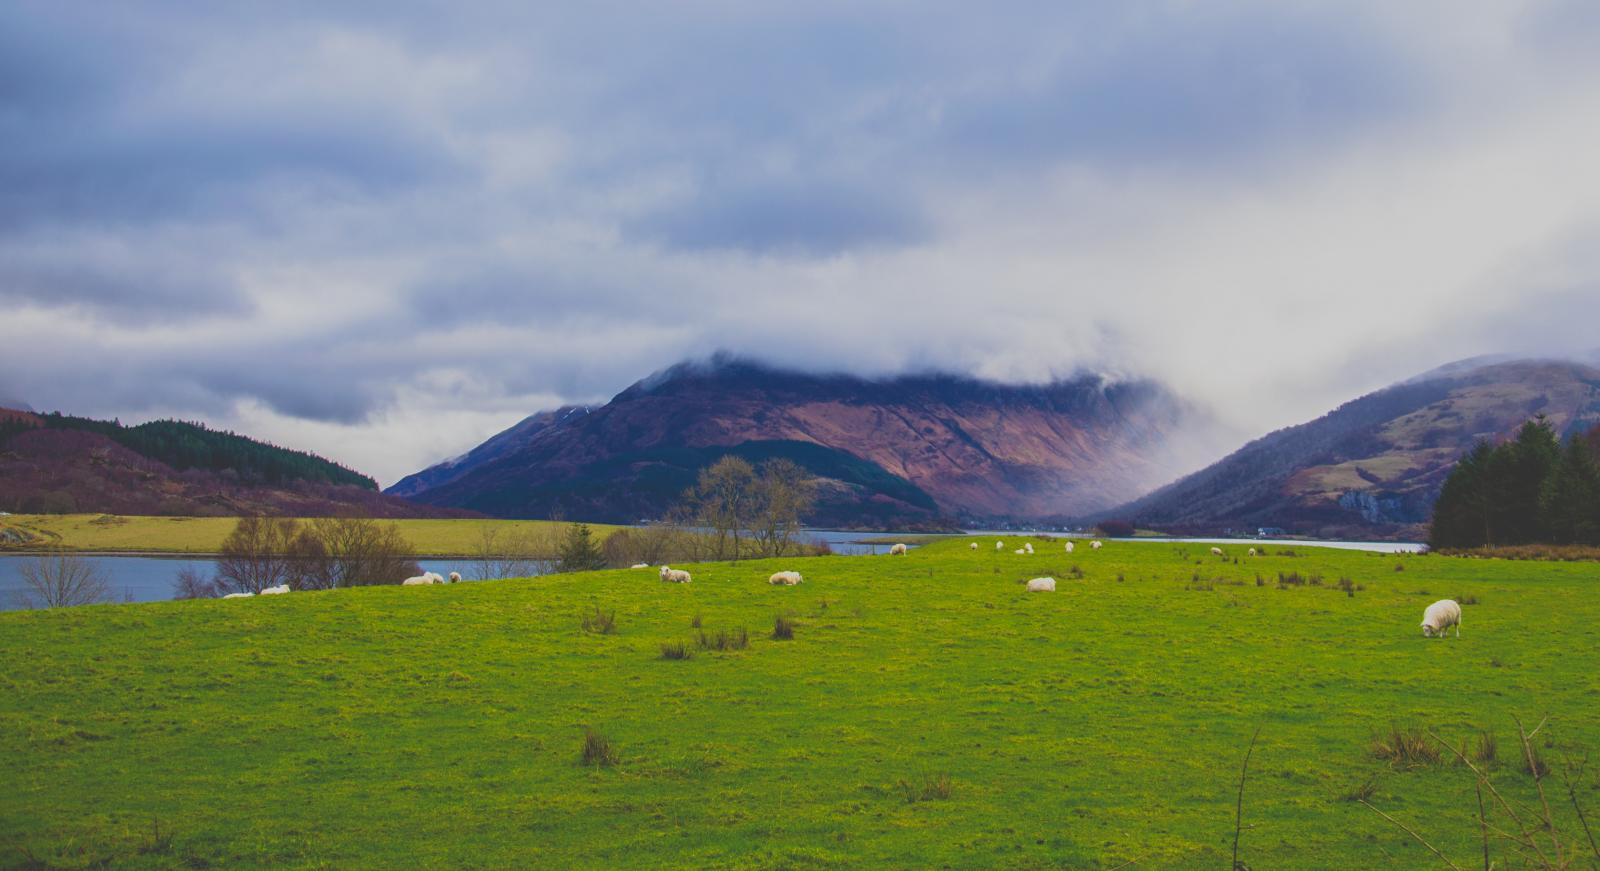 Scottish fields. Photo credit: Pexels